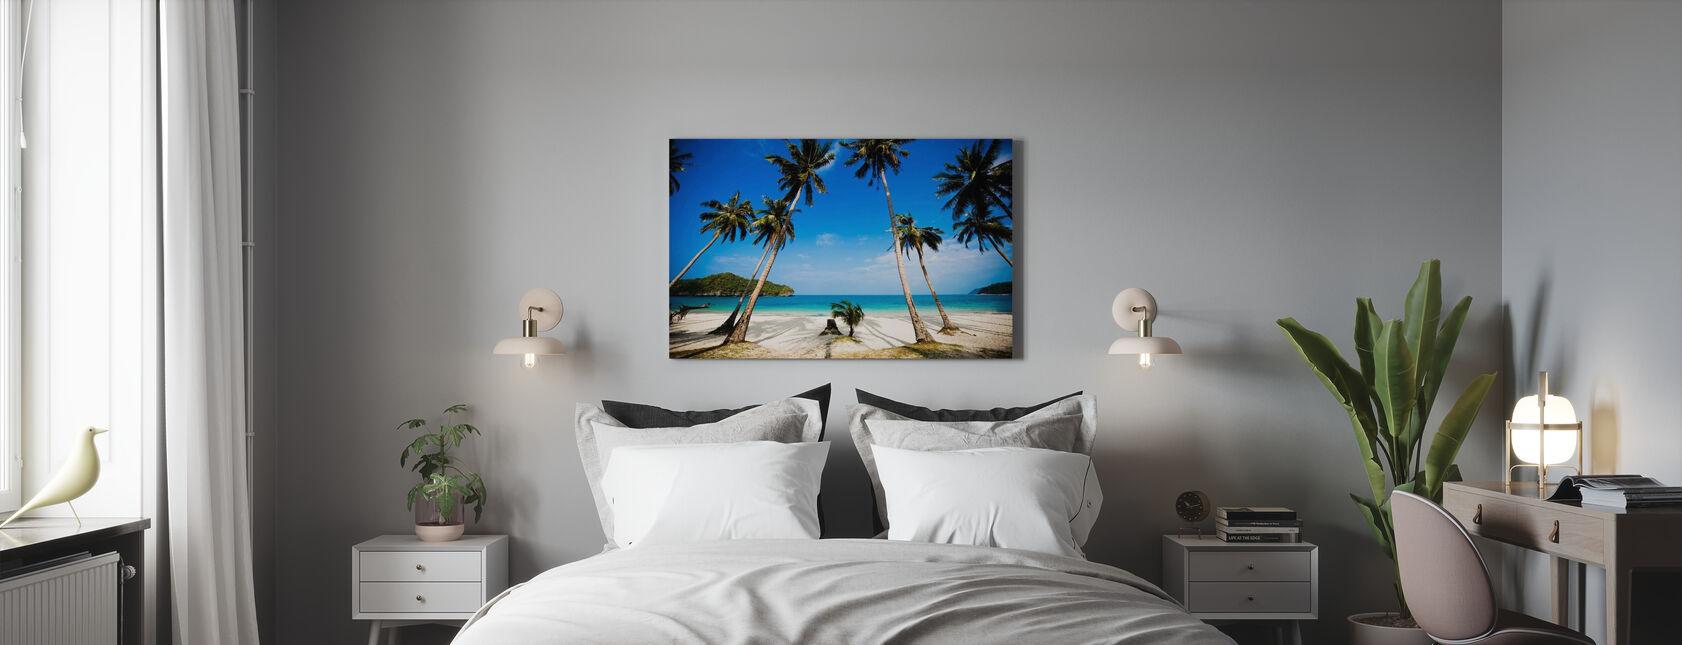 Kokospalmen, Thailand - Canvas print - Slaapkamer